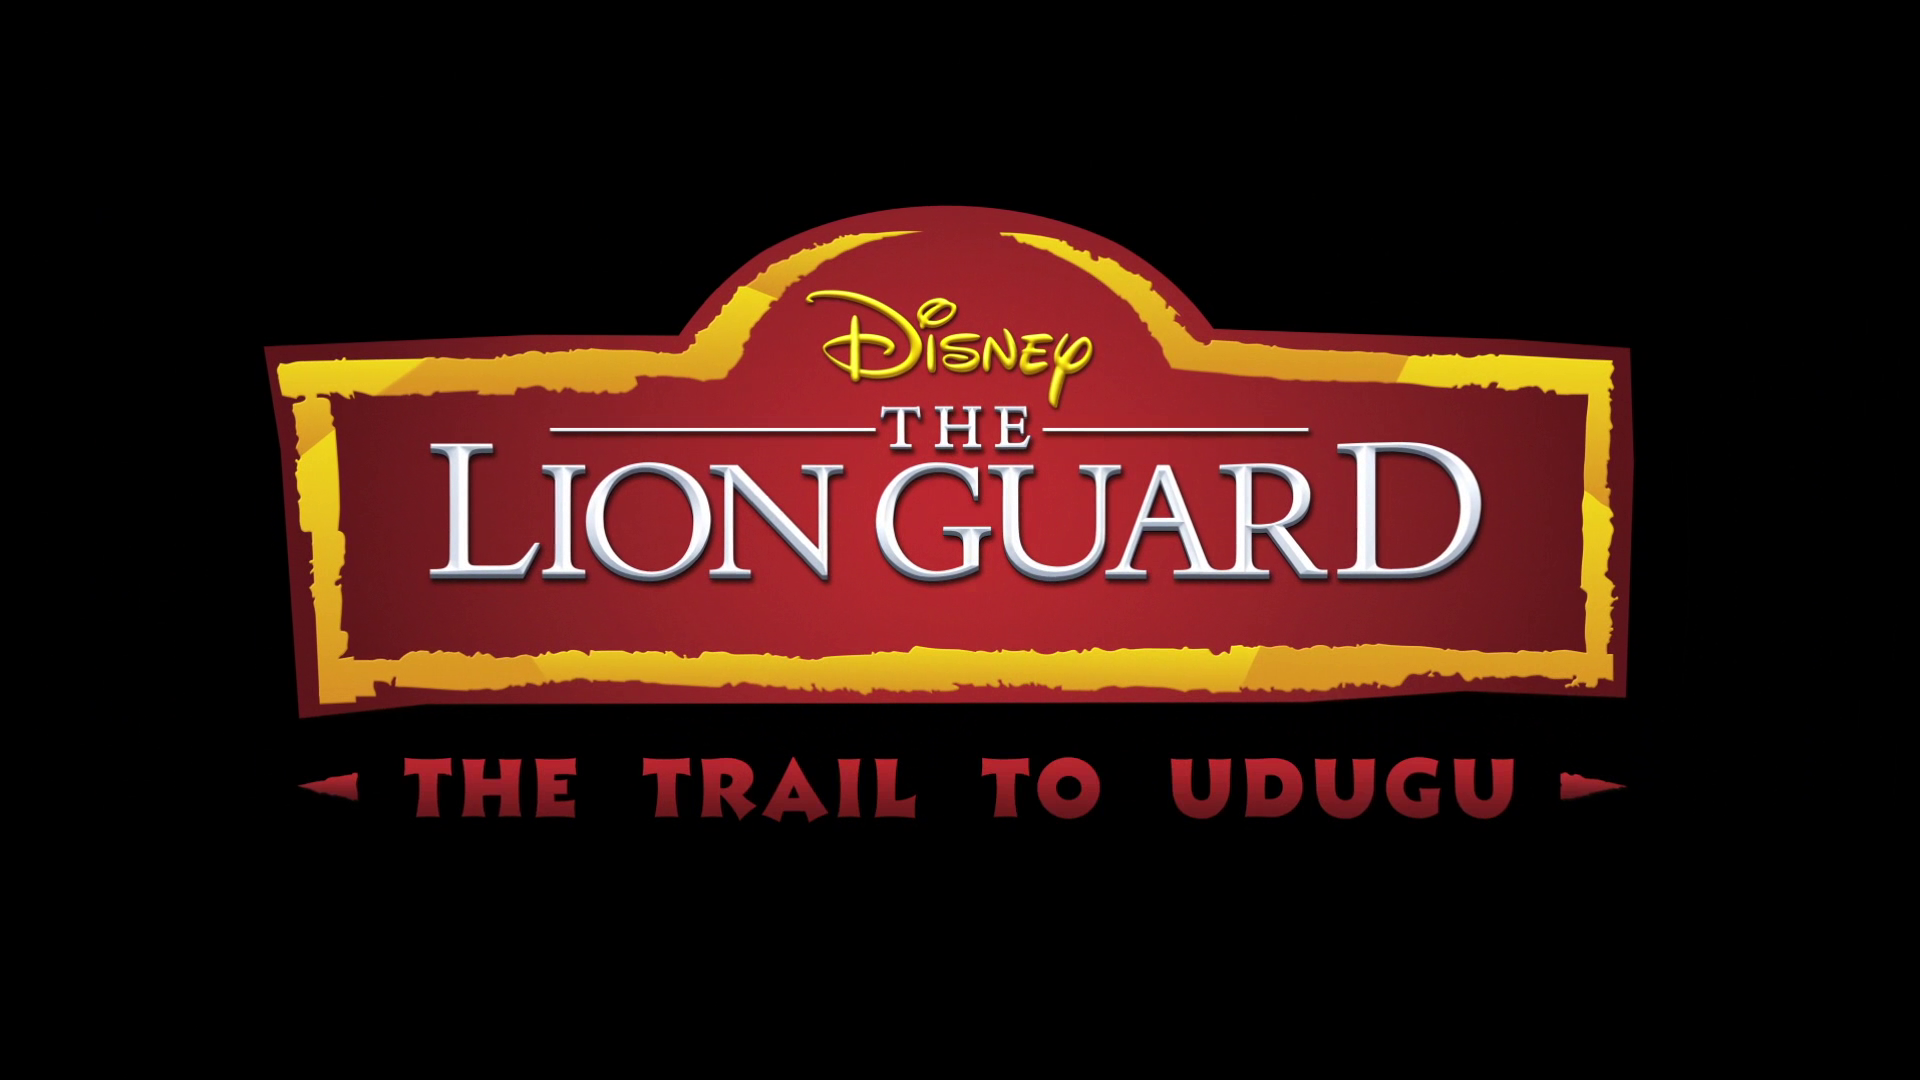 The Trail to Udugu